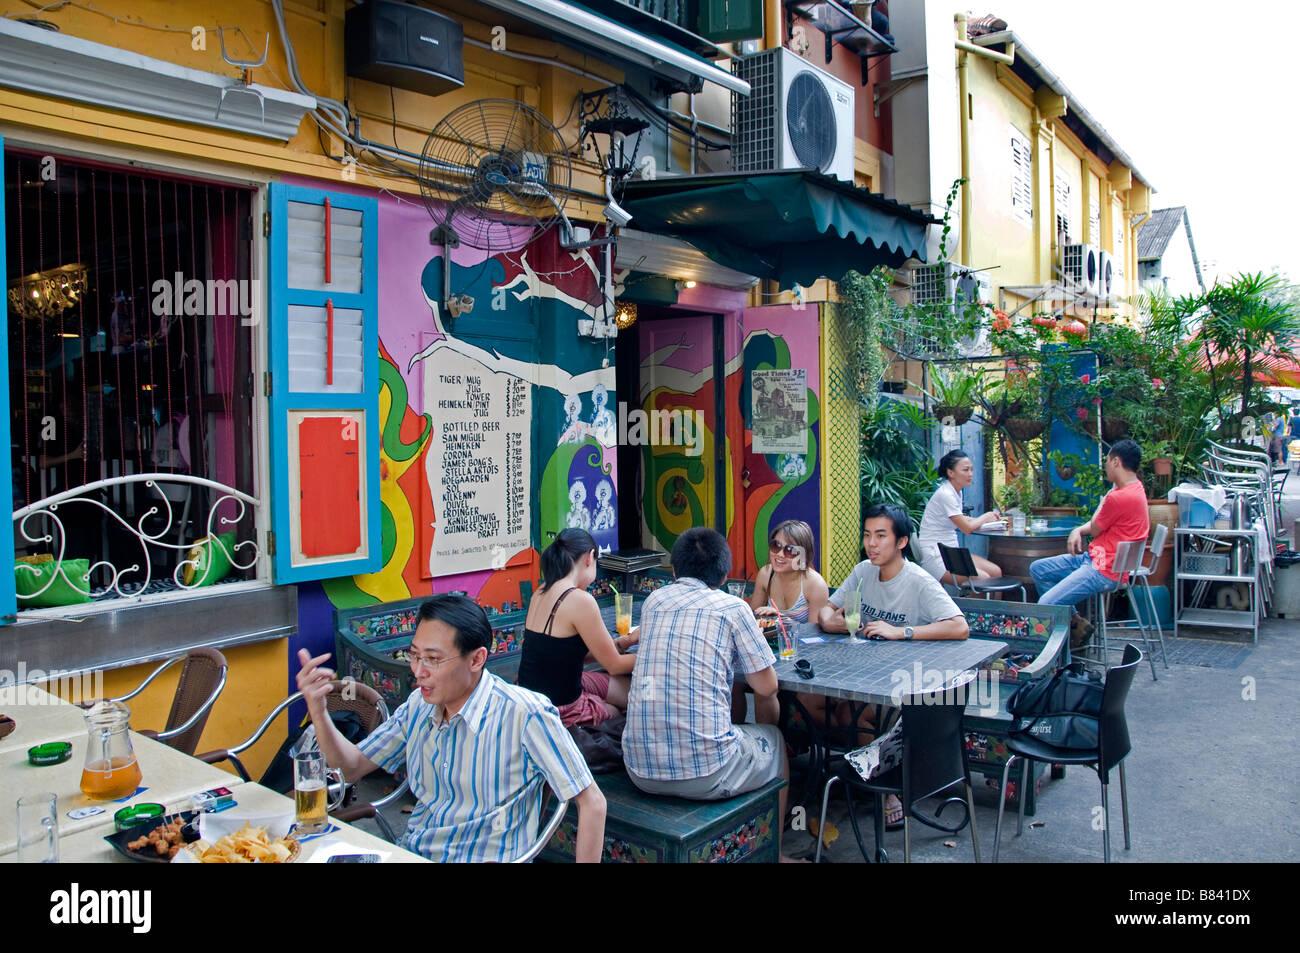 Arab Quarter Singapore Kampong Glam terrace pavement restaurant bar cafe - Stock Image